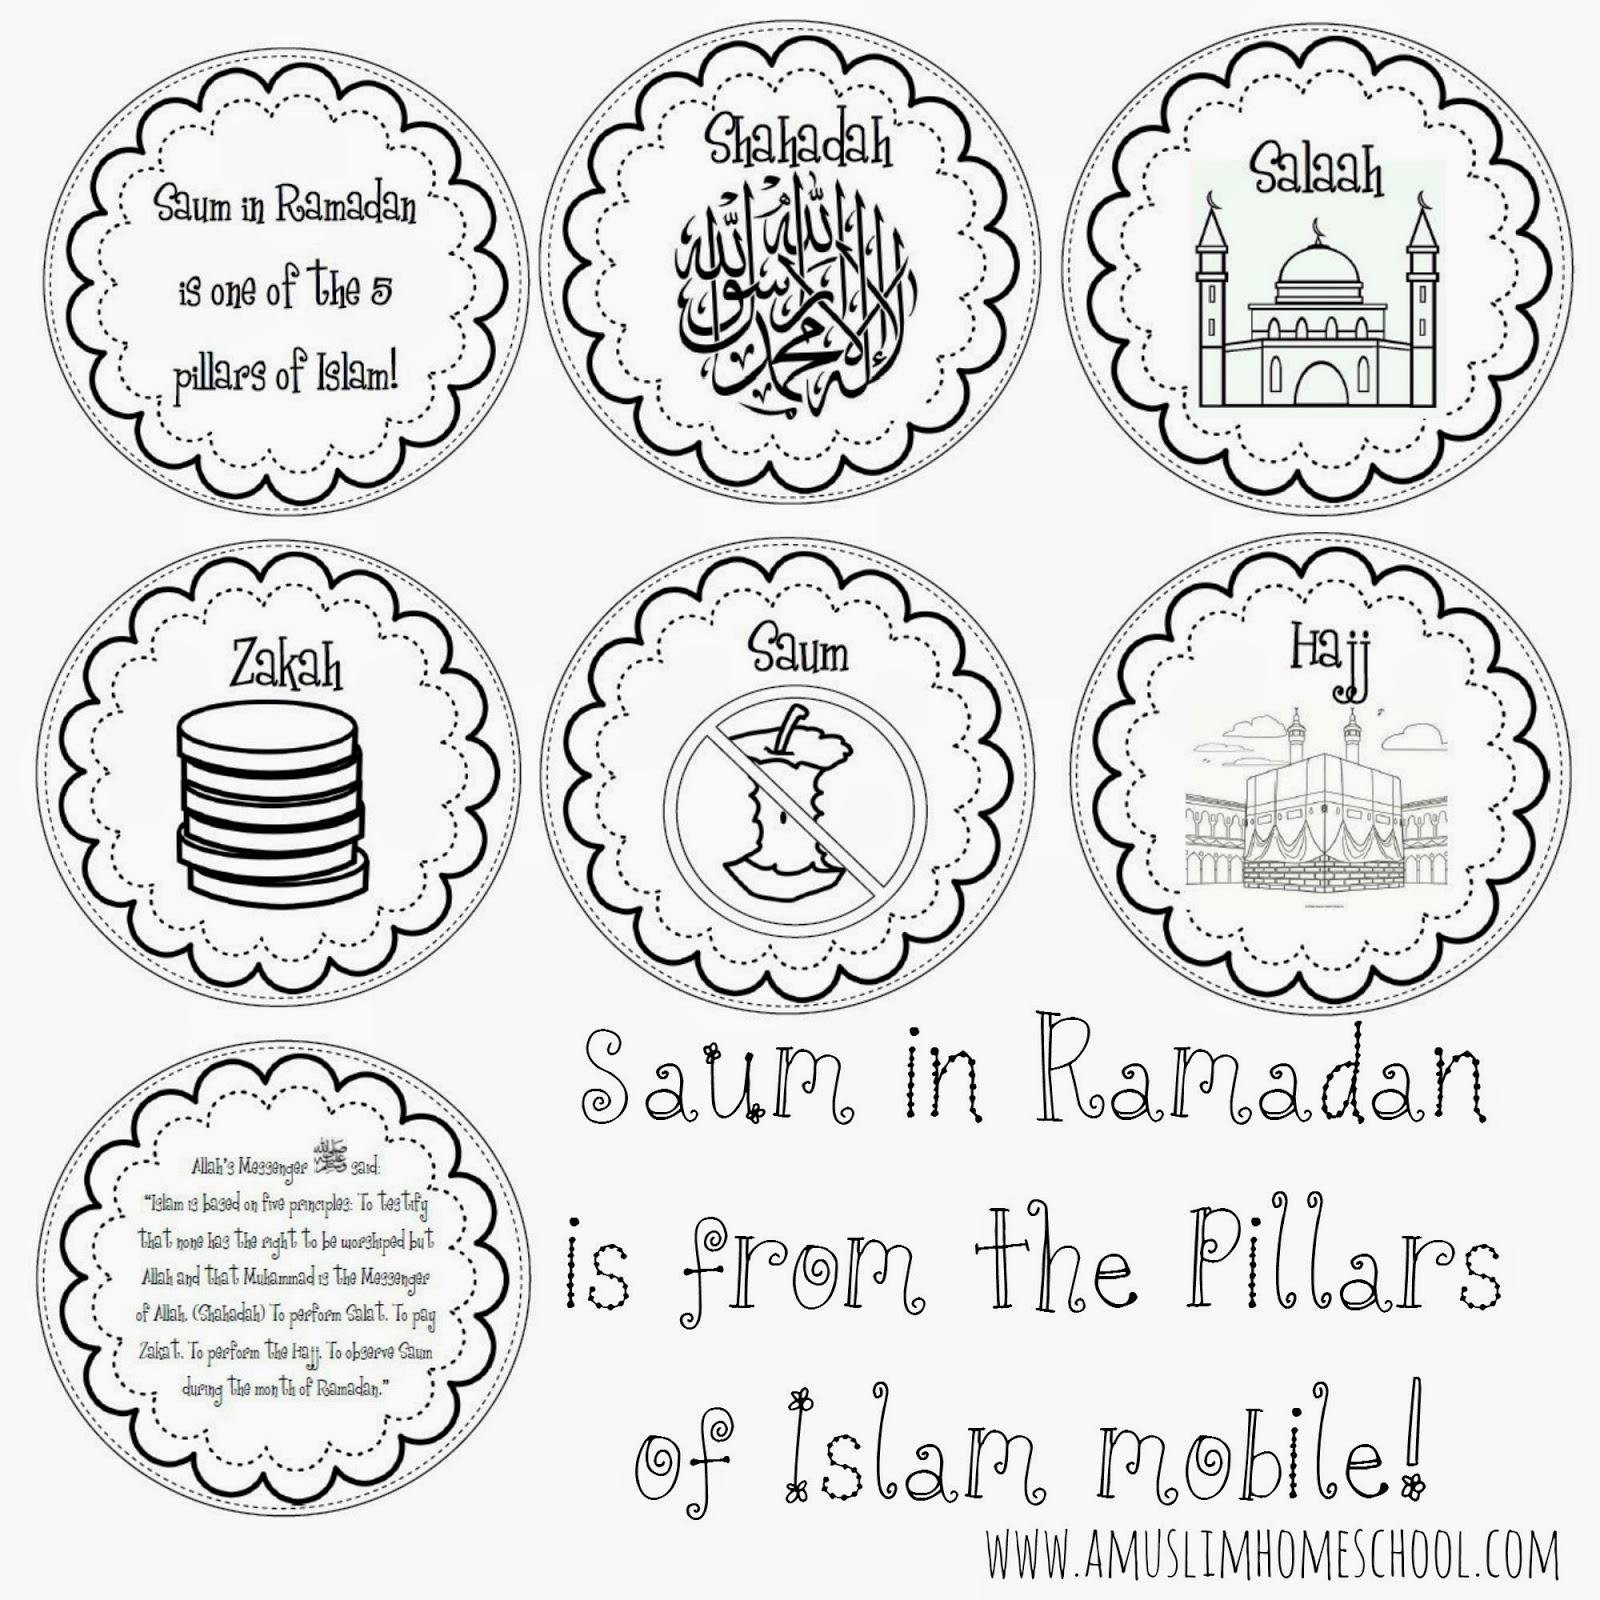 Iman S Home School Saum In Ramadan Is From The 5 Pillars